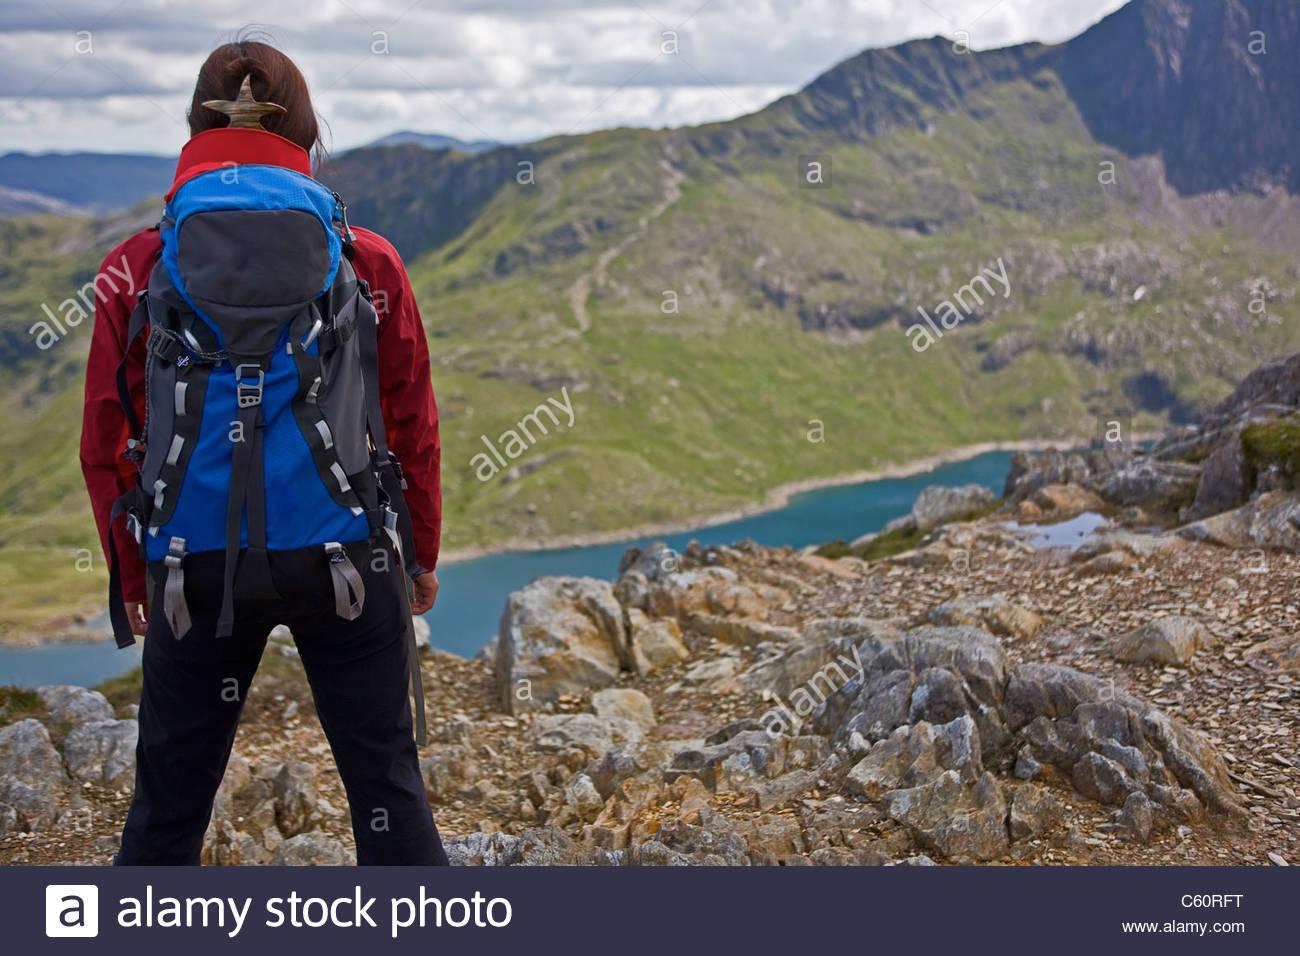 Hiker overlooking landscape - Stock Image